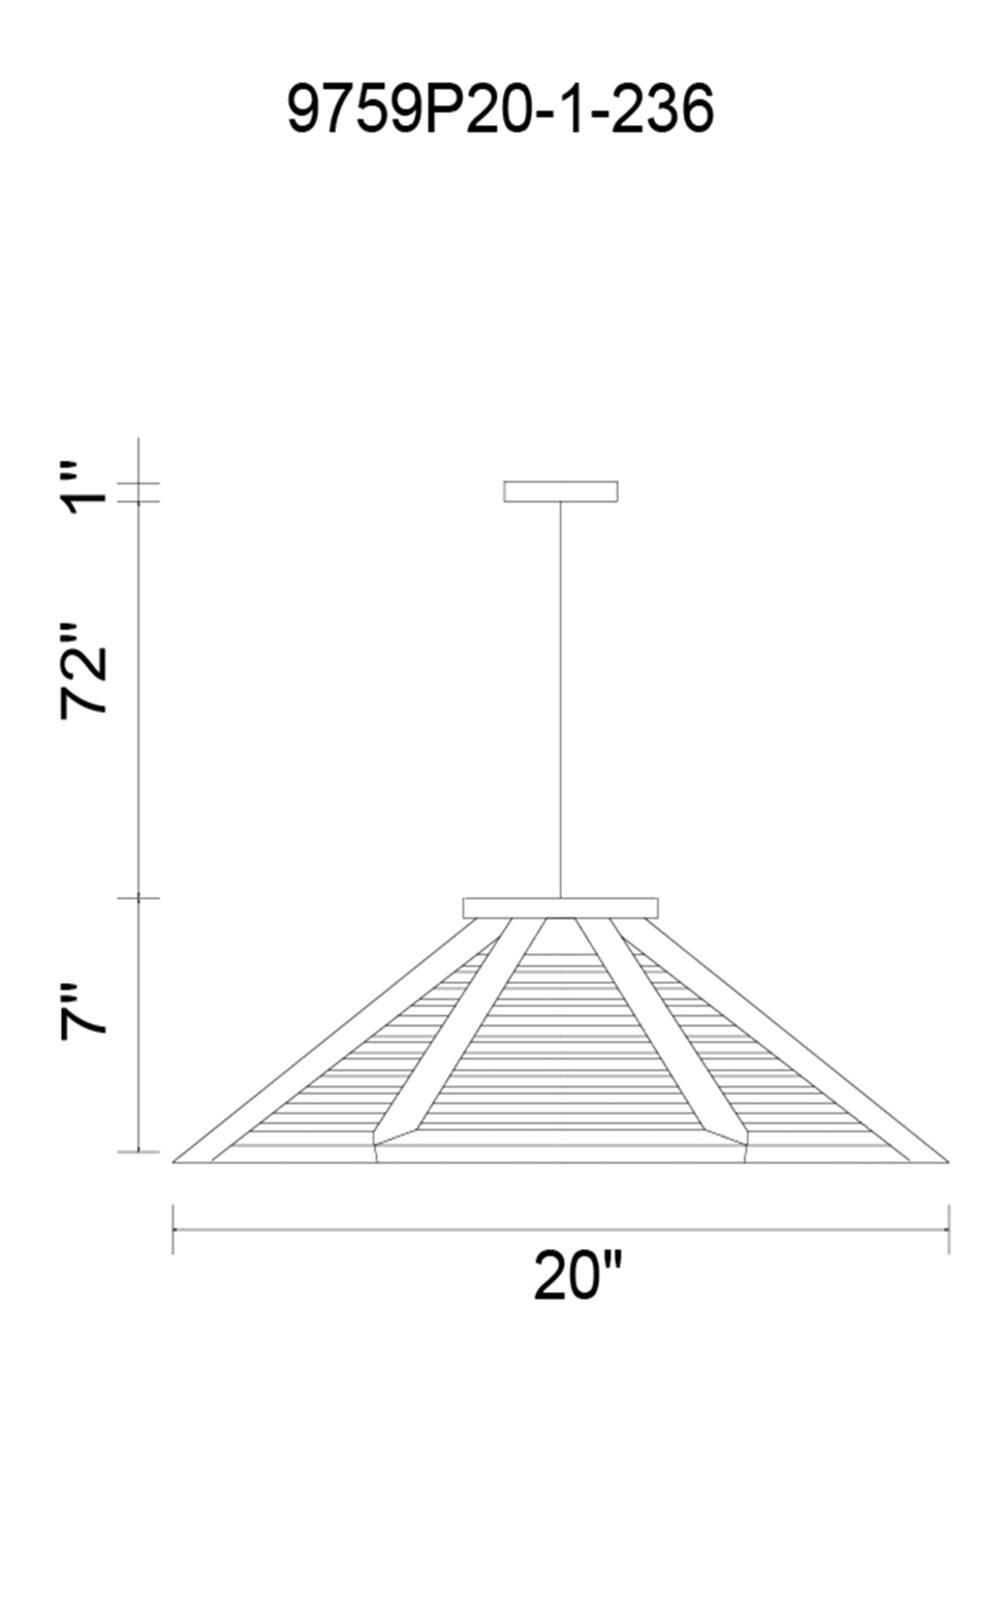 CWI Lighting Lante 1 Light Down Pendant With Black & Wood Finish Model: 9759P20-1-236 Line Drawing